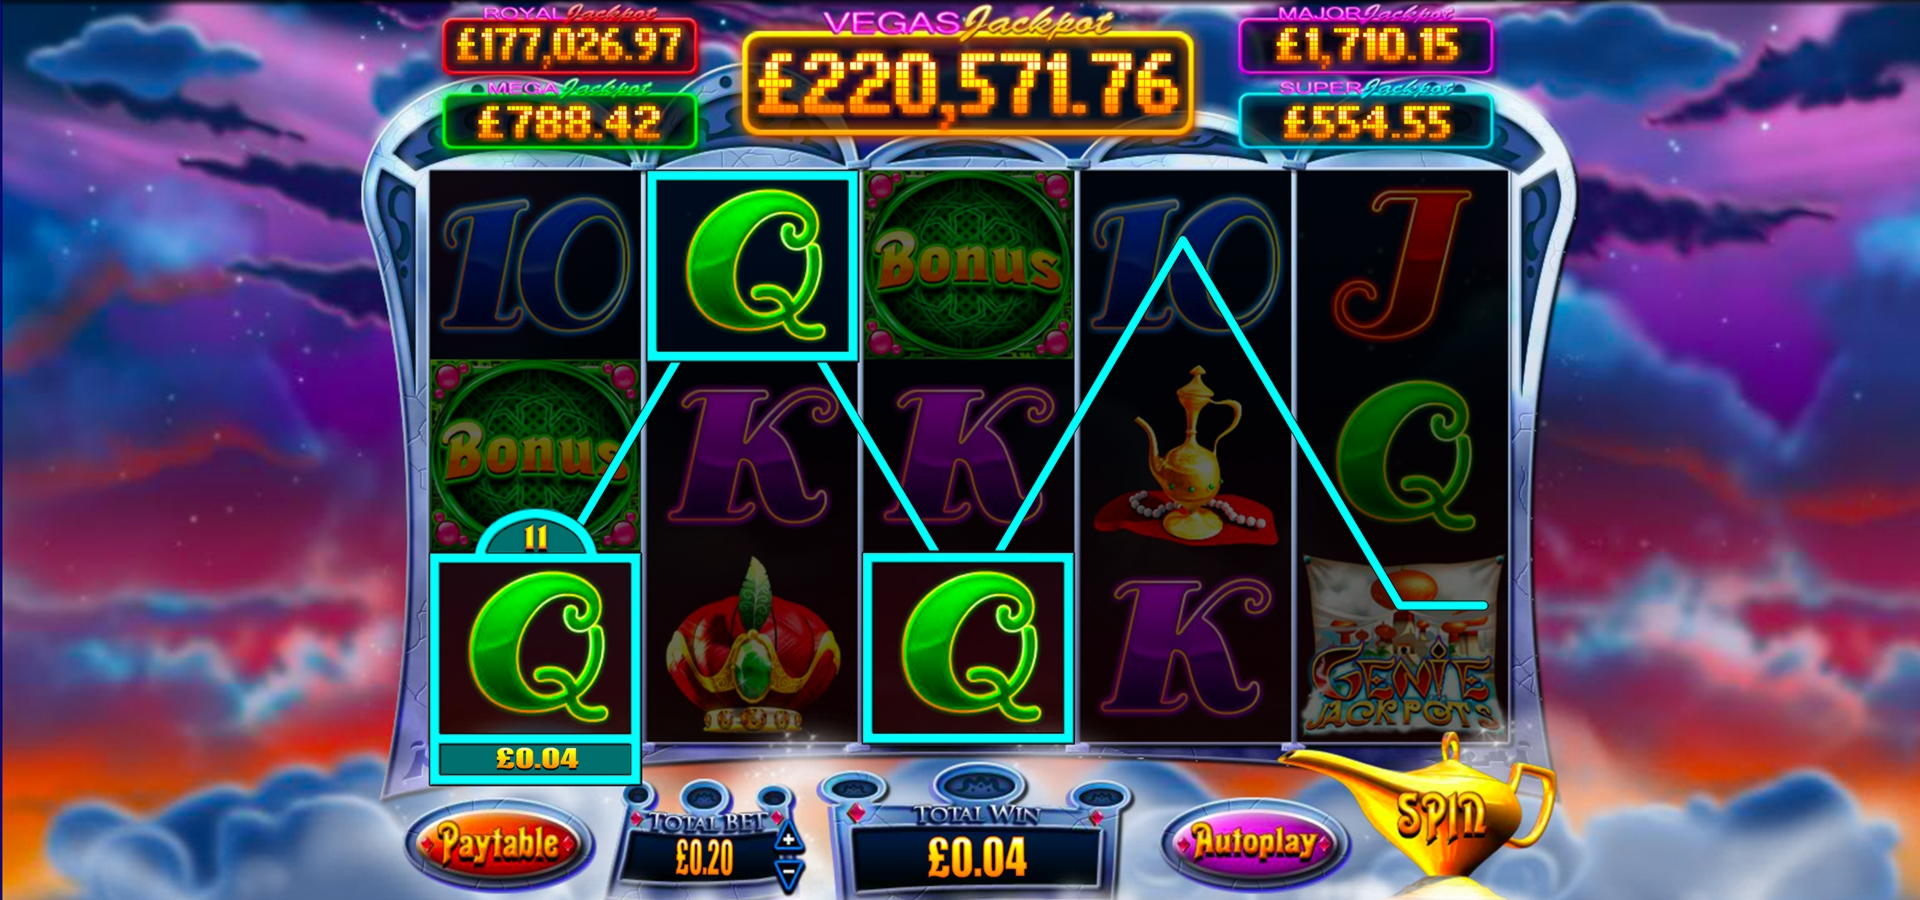 EUR 470 Free Casino Chip at Uptown Pokies Casino